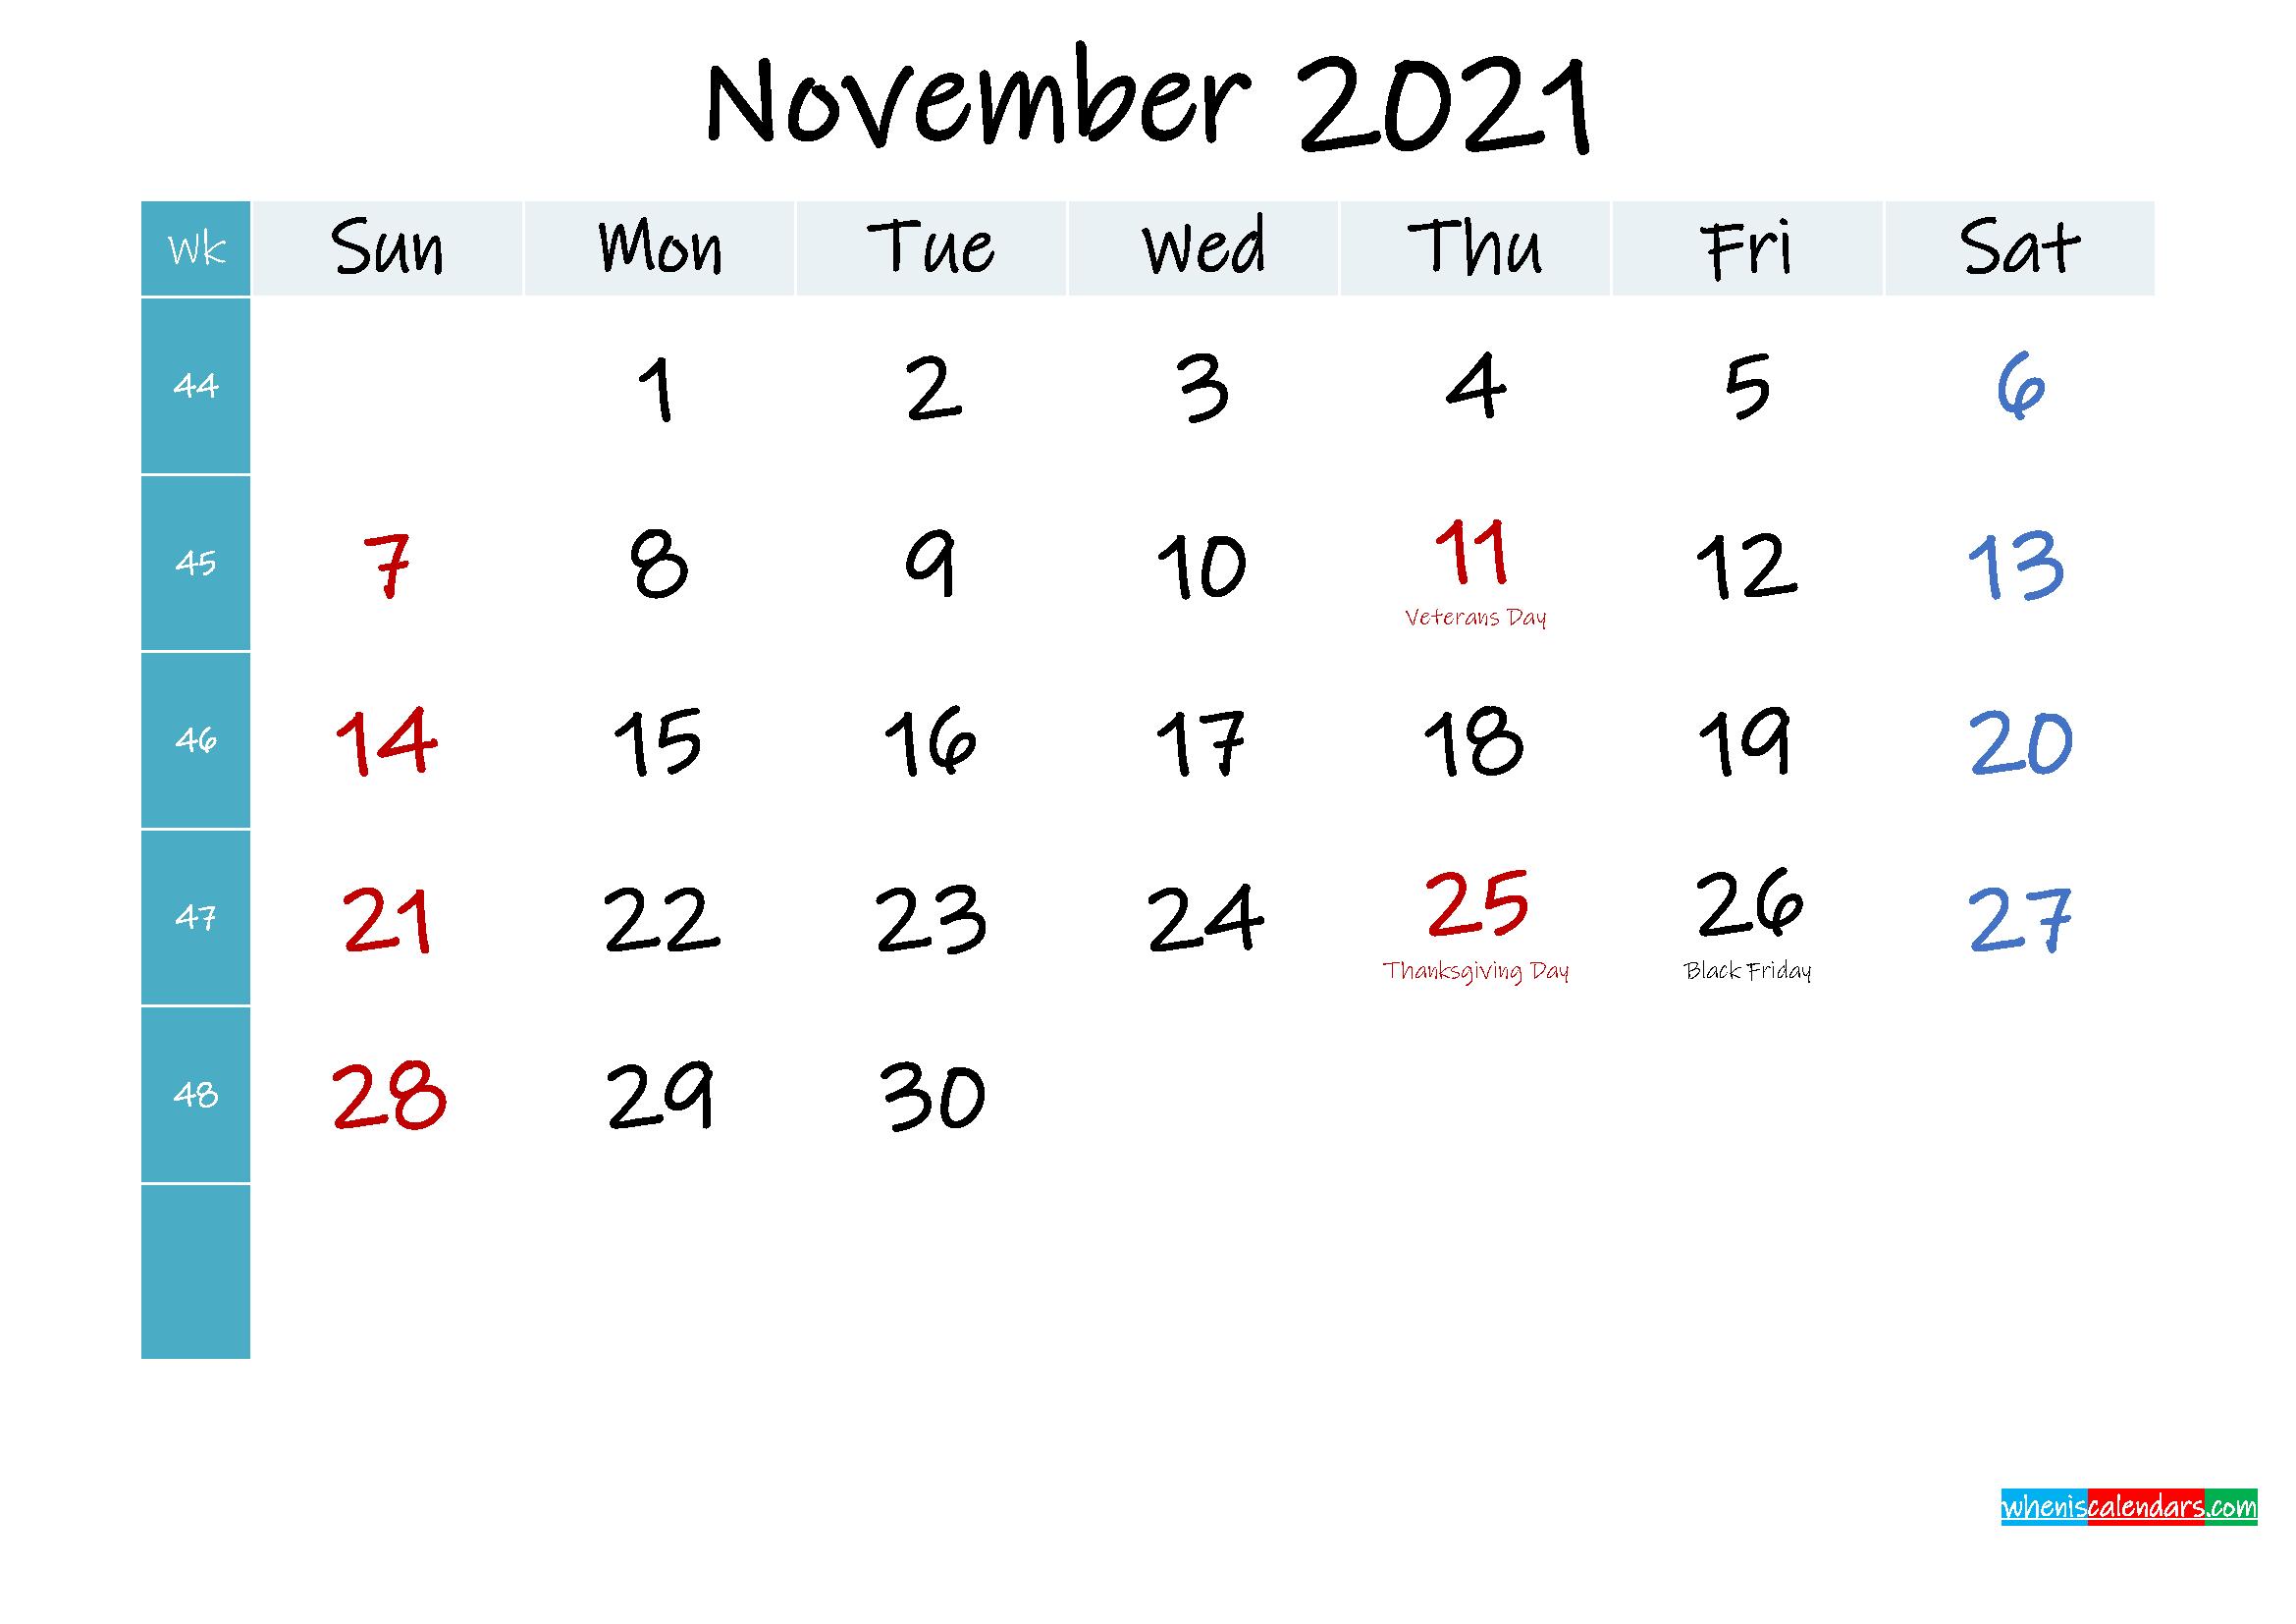 November 2021 Free Printable Calendar - Template No.ink21M407